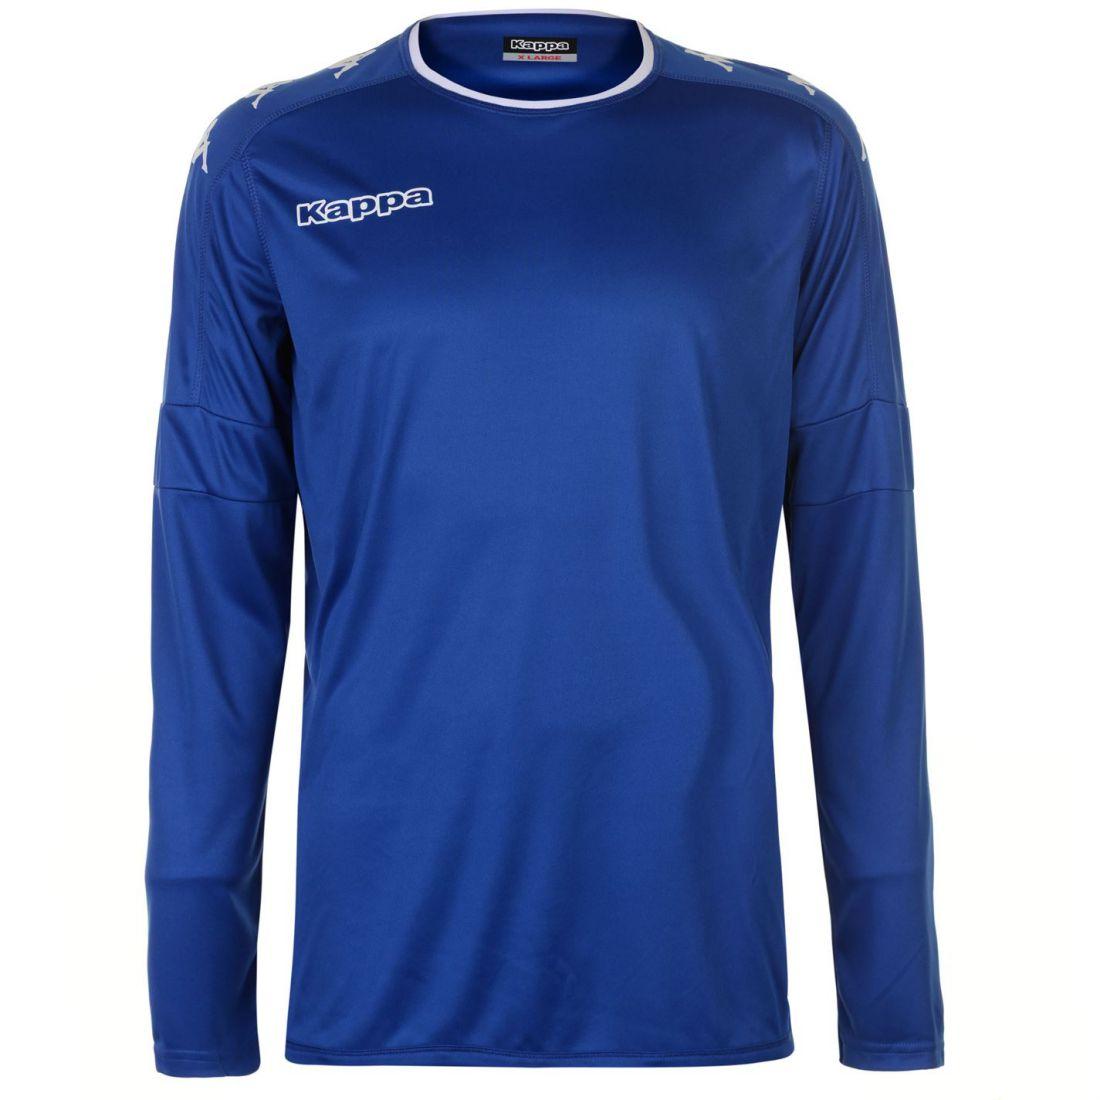 Activewear Tops Blue. Activewear Kappa Santos Long Sleeve Mens Large